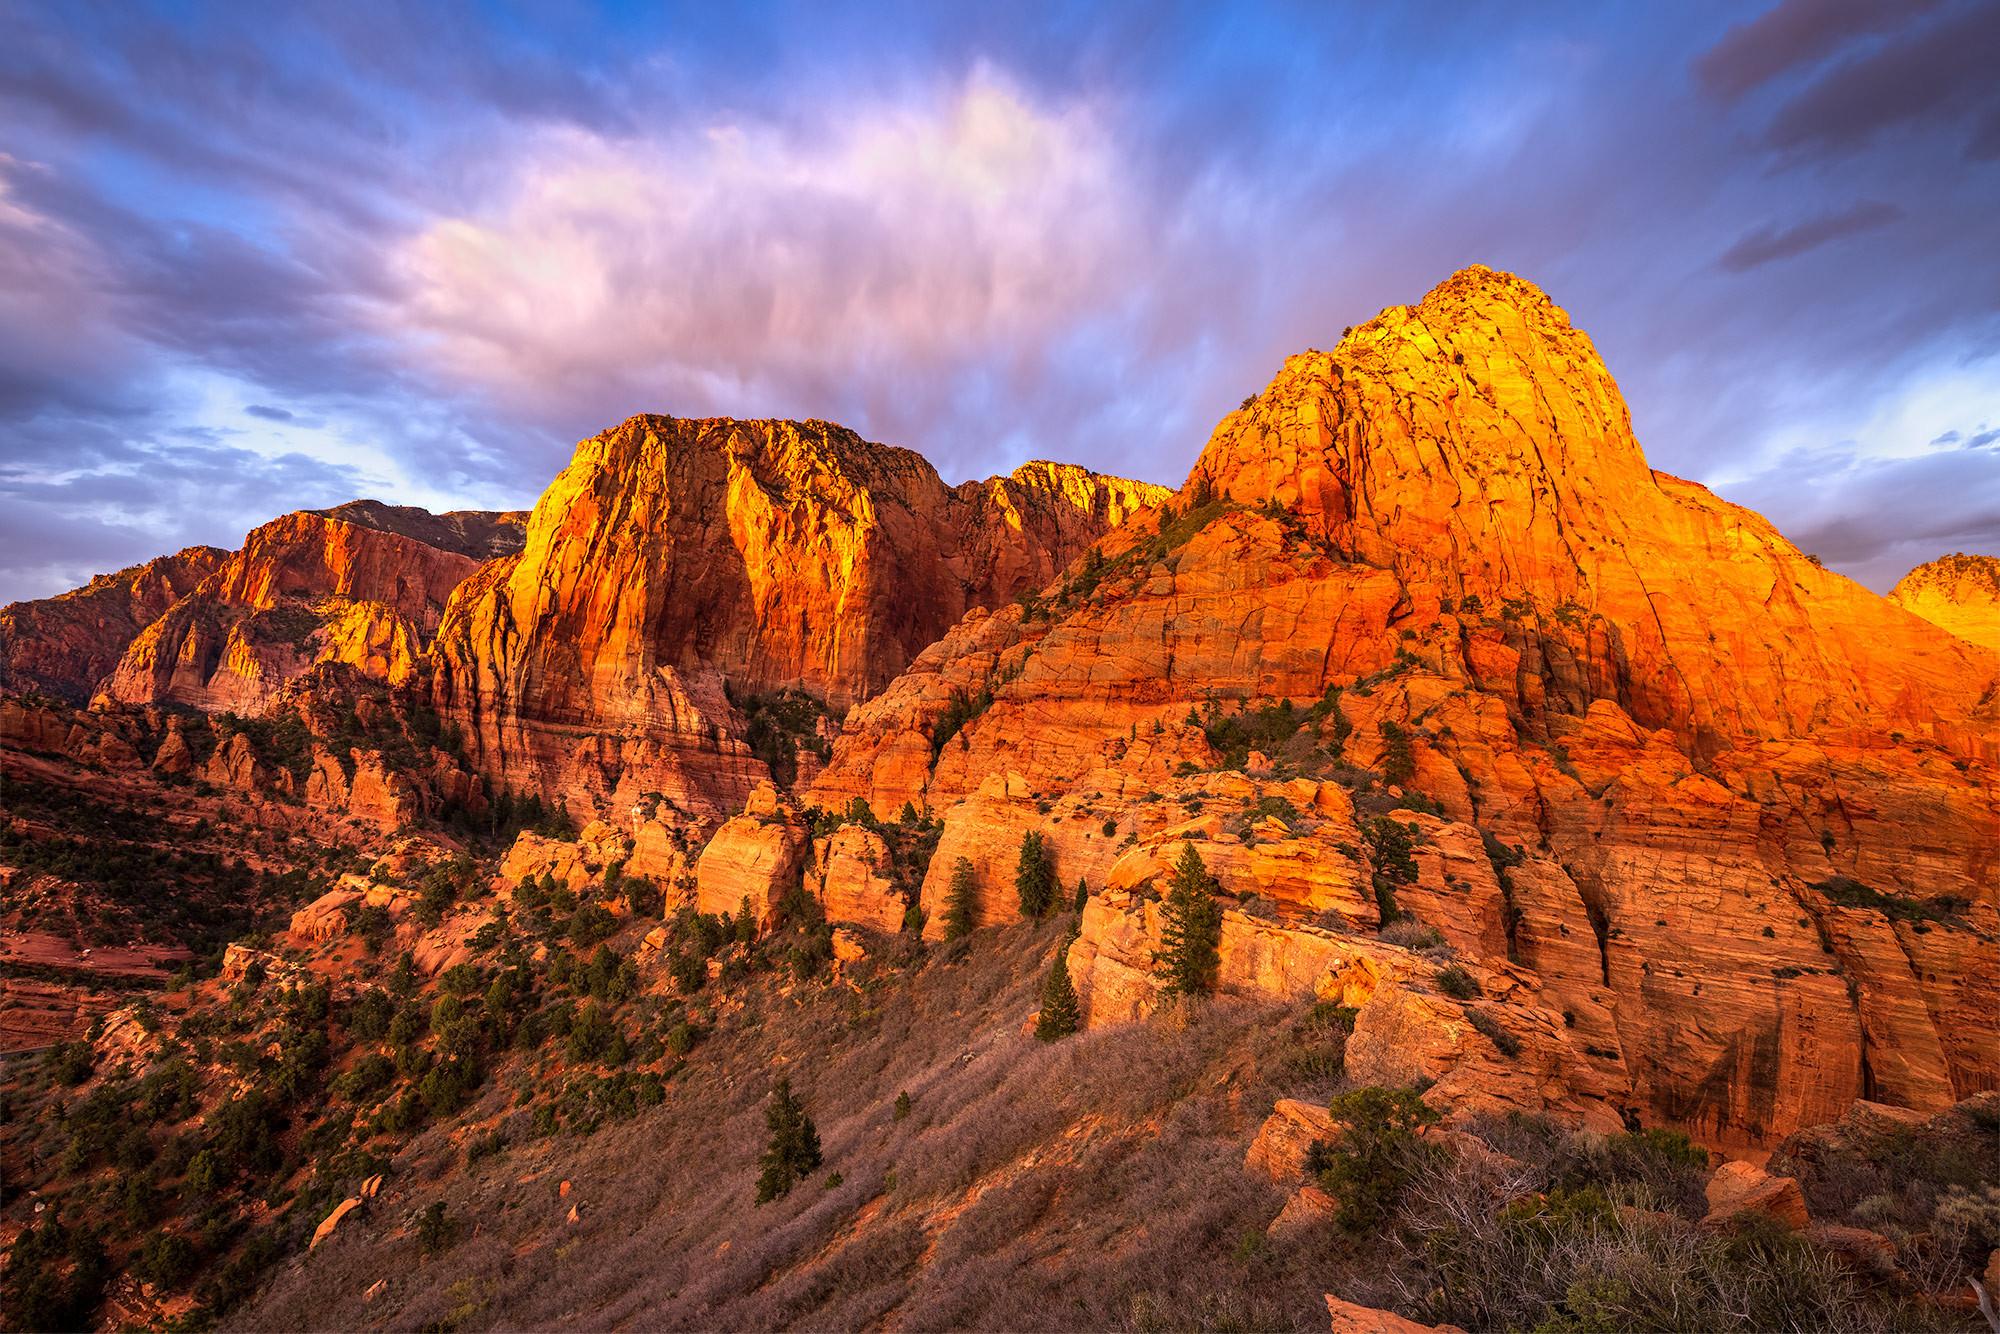 2022 Zion National Park 2 Day Workshop